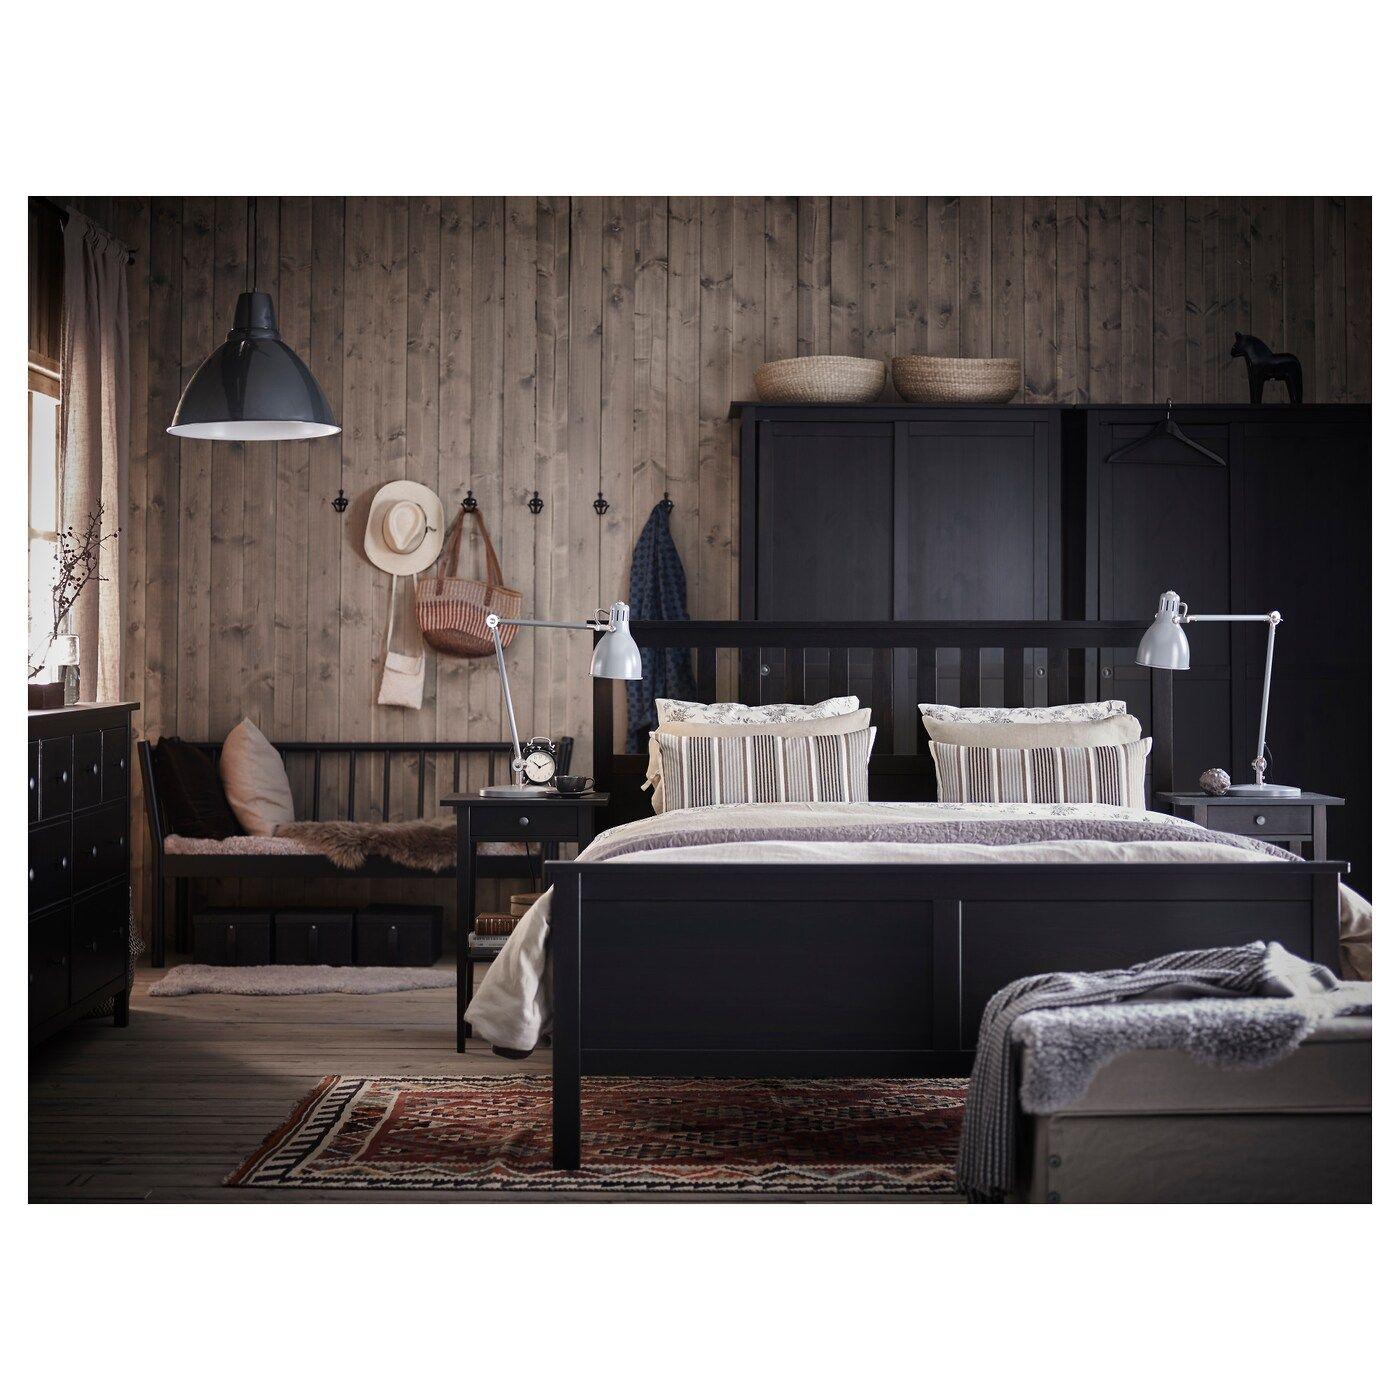 Hemnes Bed Frame Black Brown Luroy Queen Ikea Hemnes Bett Schwarze Schlafzimmermobel Bettgestell